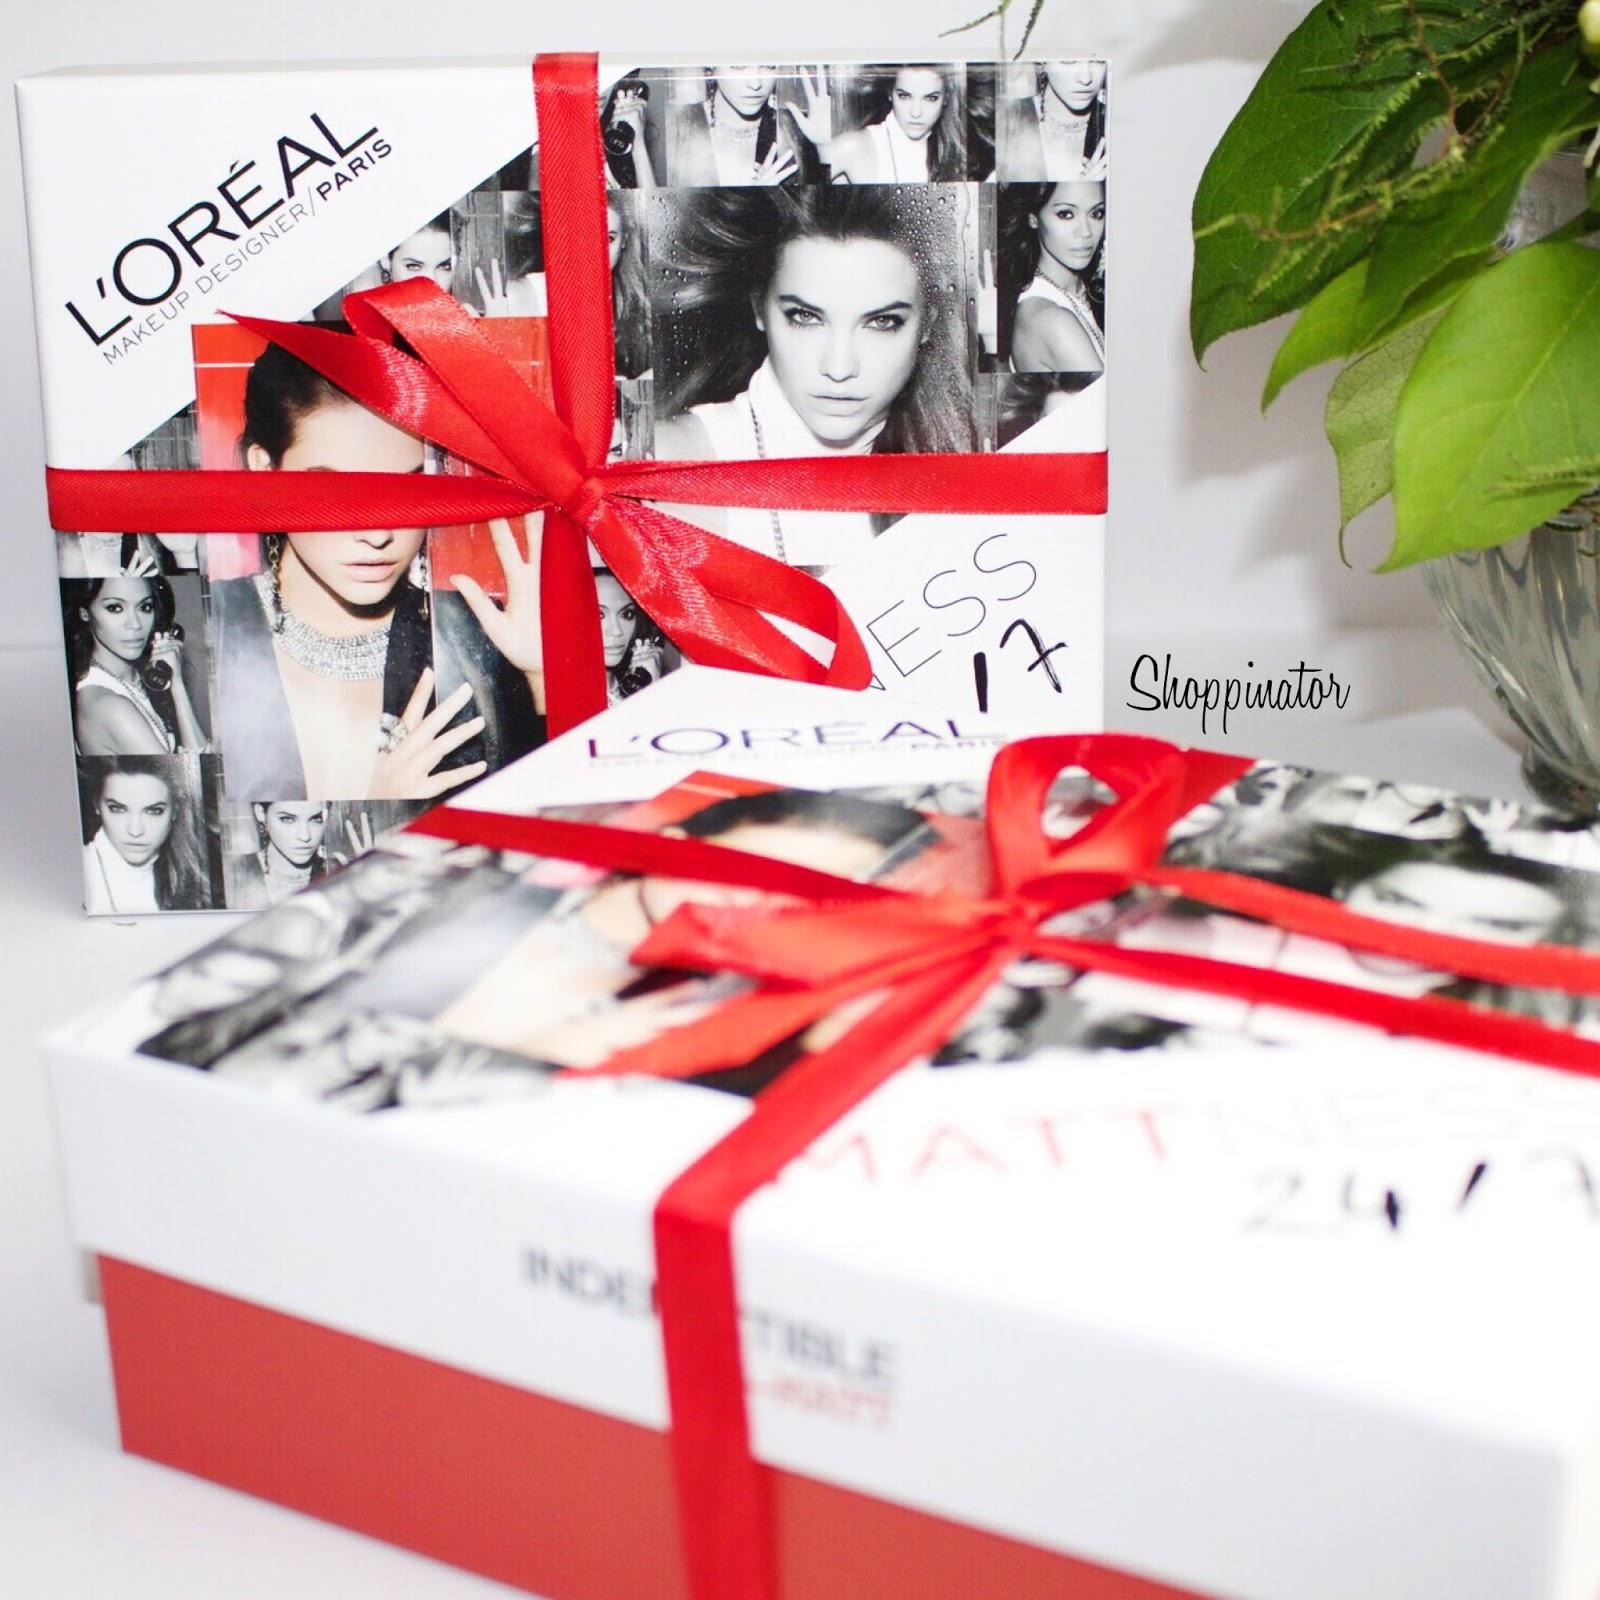 Loreal-Shoppinator-Indefectible-Matt-Neu-Foundation-Review